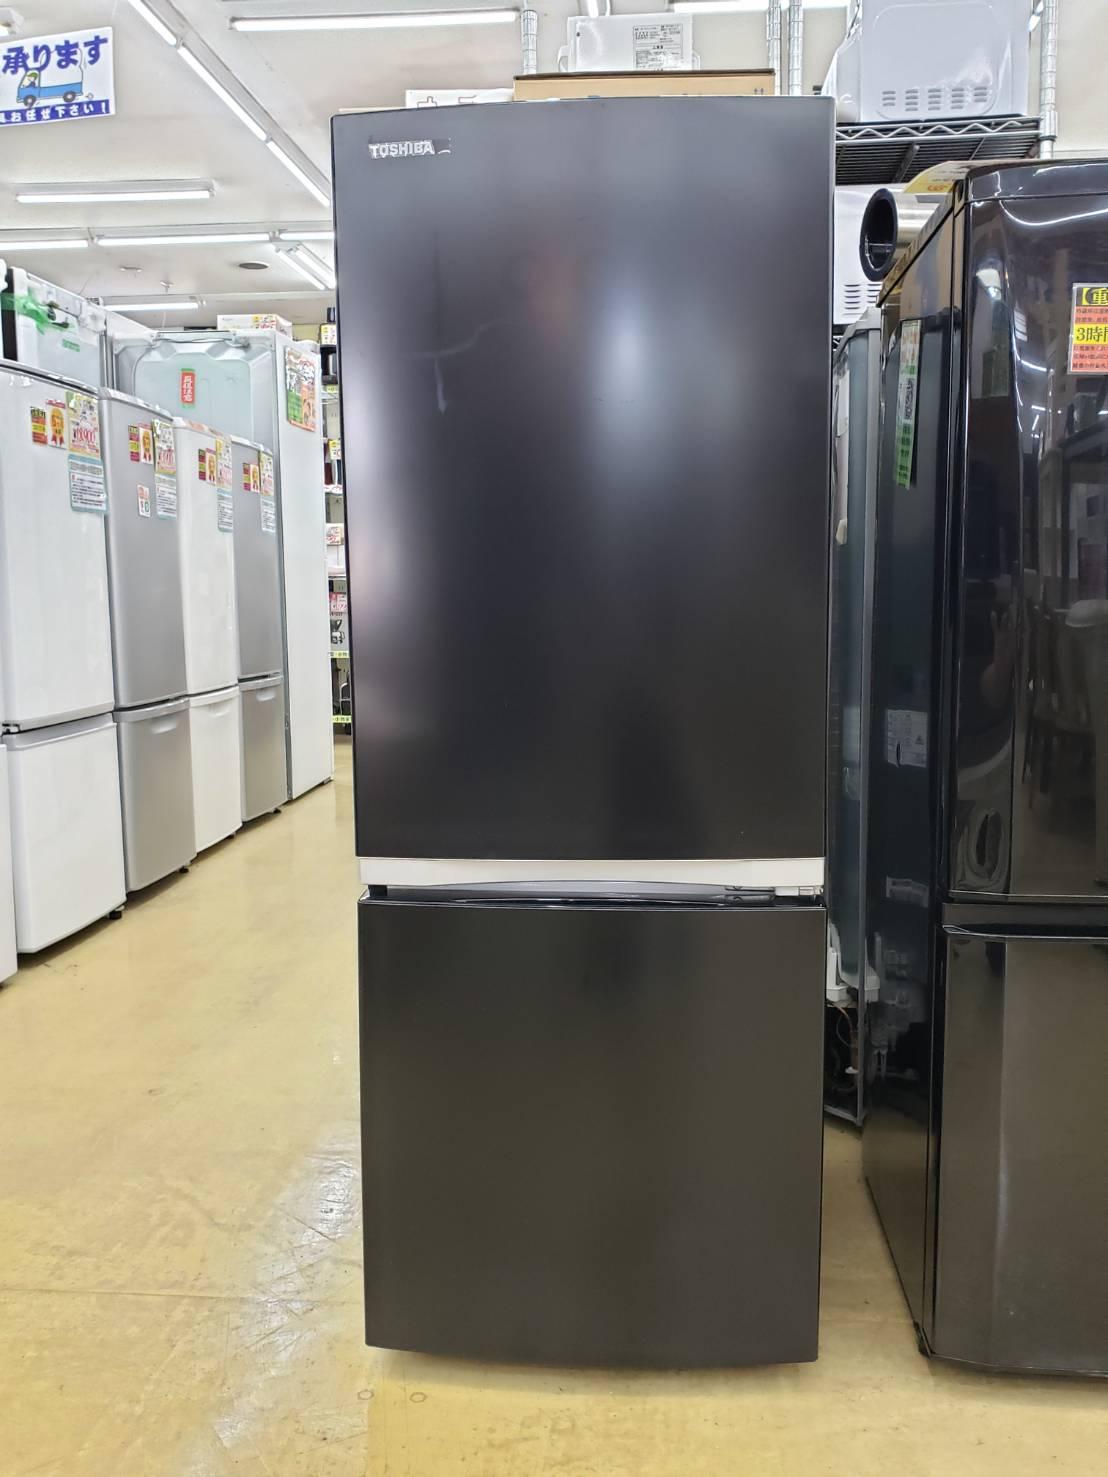 TOUSHIBA / 東芝 153L冷蔵庫 2020年製 GR-R15BS 買取致しました の買取-